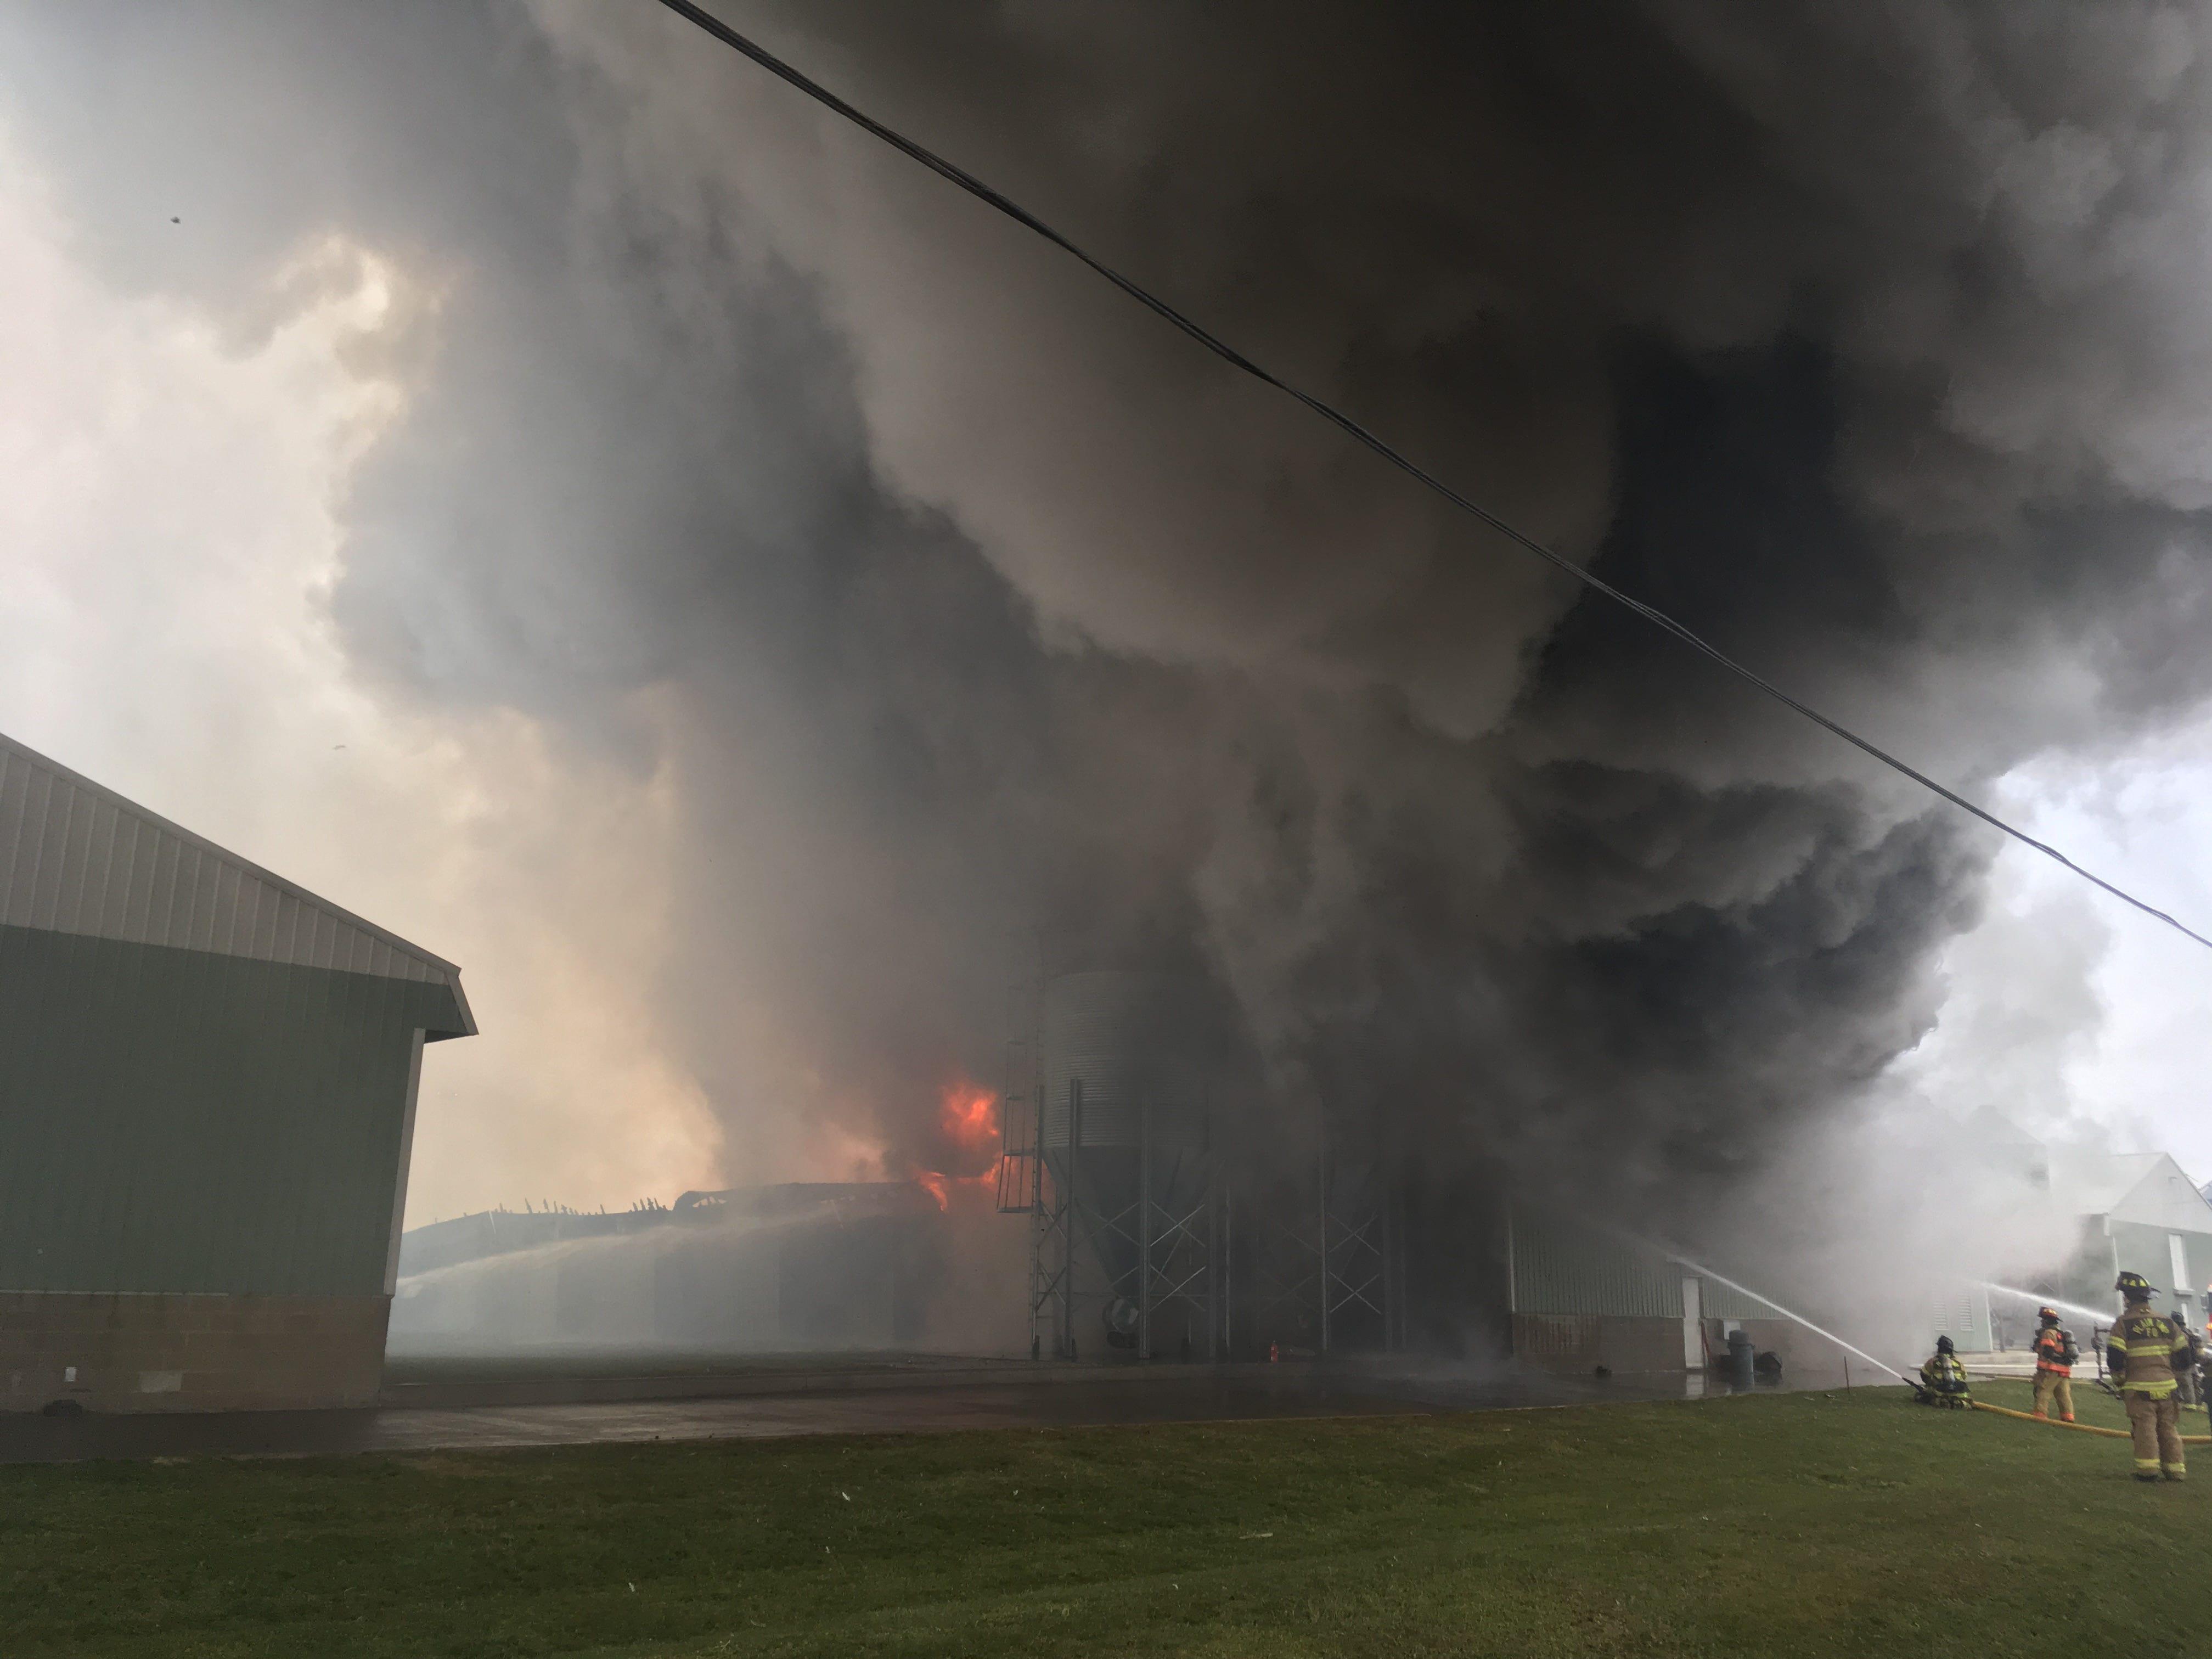 Firefighters battle a blaze at Trillium Farms in Croton on Nov. 30, 2018.